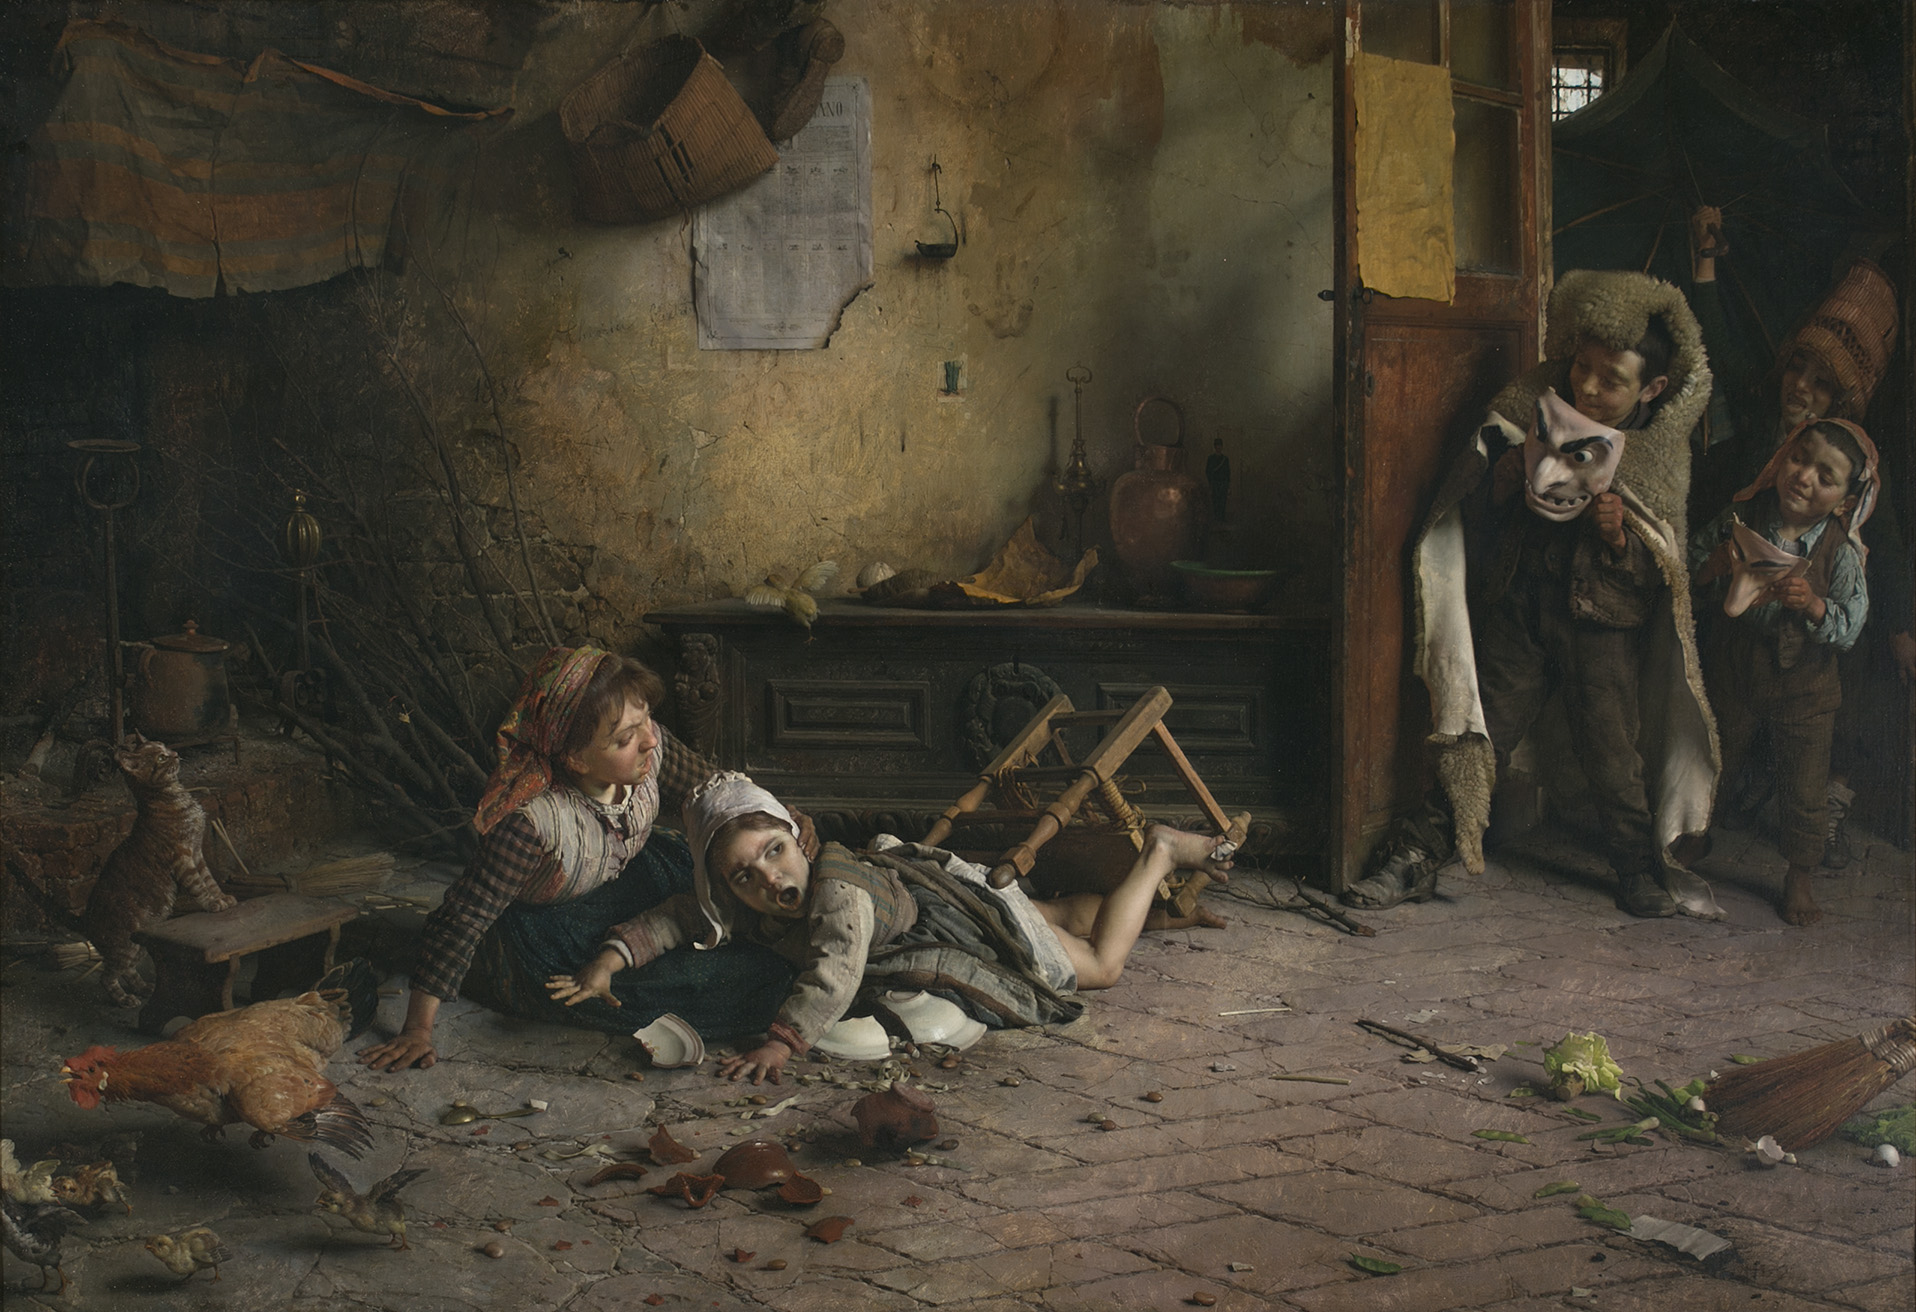 Gaetano-Chierici-Travesuras-infantiles-1888-1